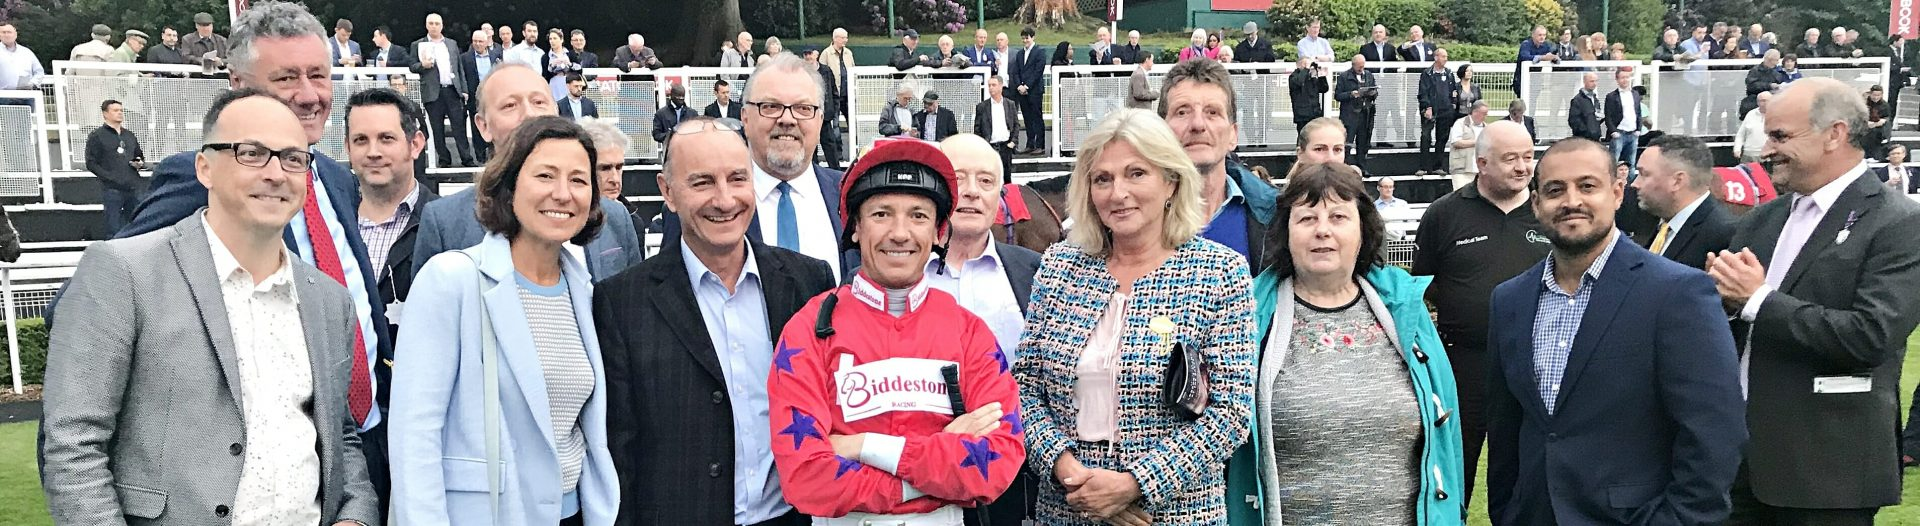 Frankie Dettori, Jockey for Biddestone Racing with Owners at Sandown Racecourse | Biddestone Racing